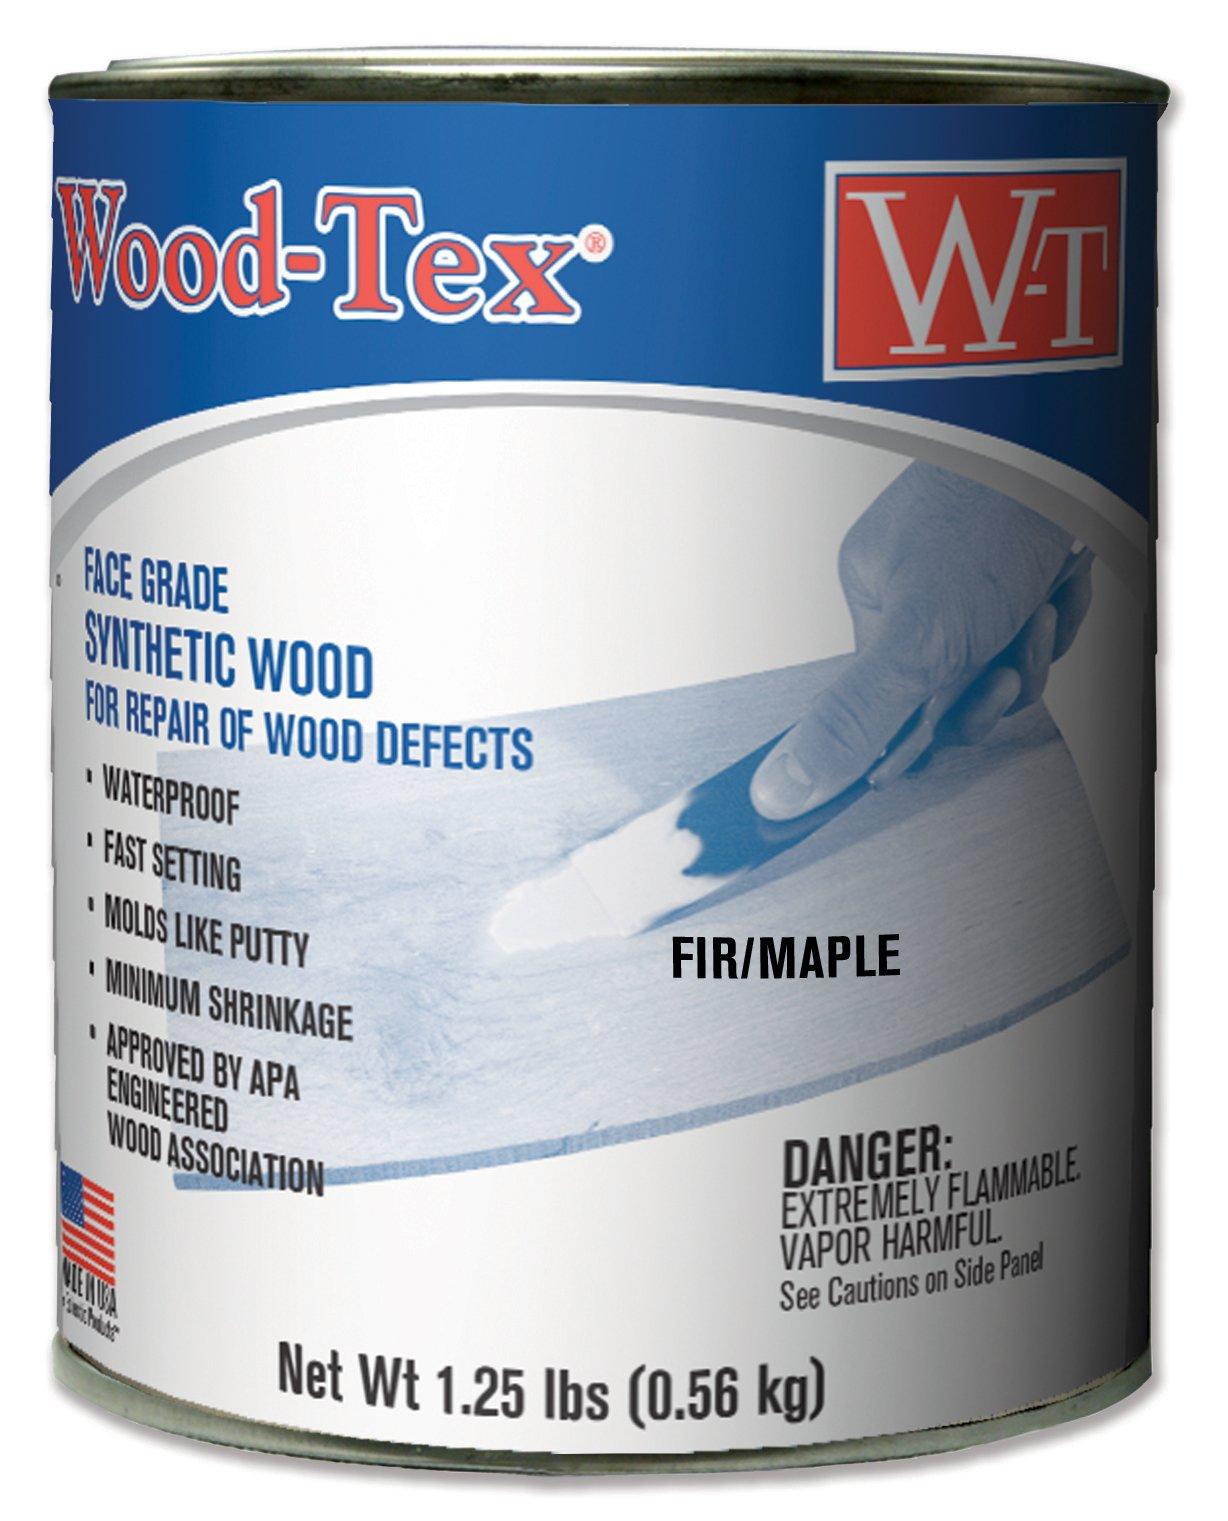 Wood-Tex 34021018 Wood Filler Adhesive - Pint, Fir/Maple